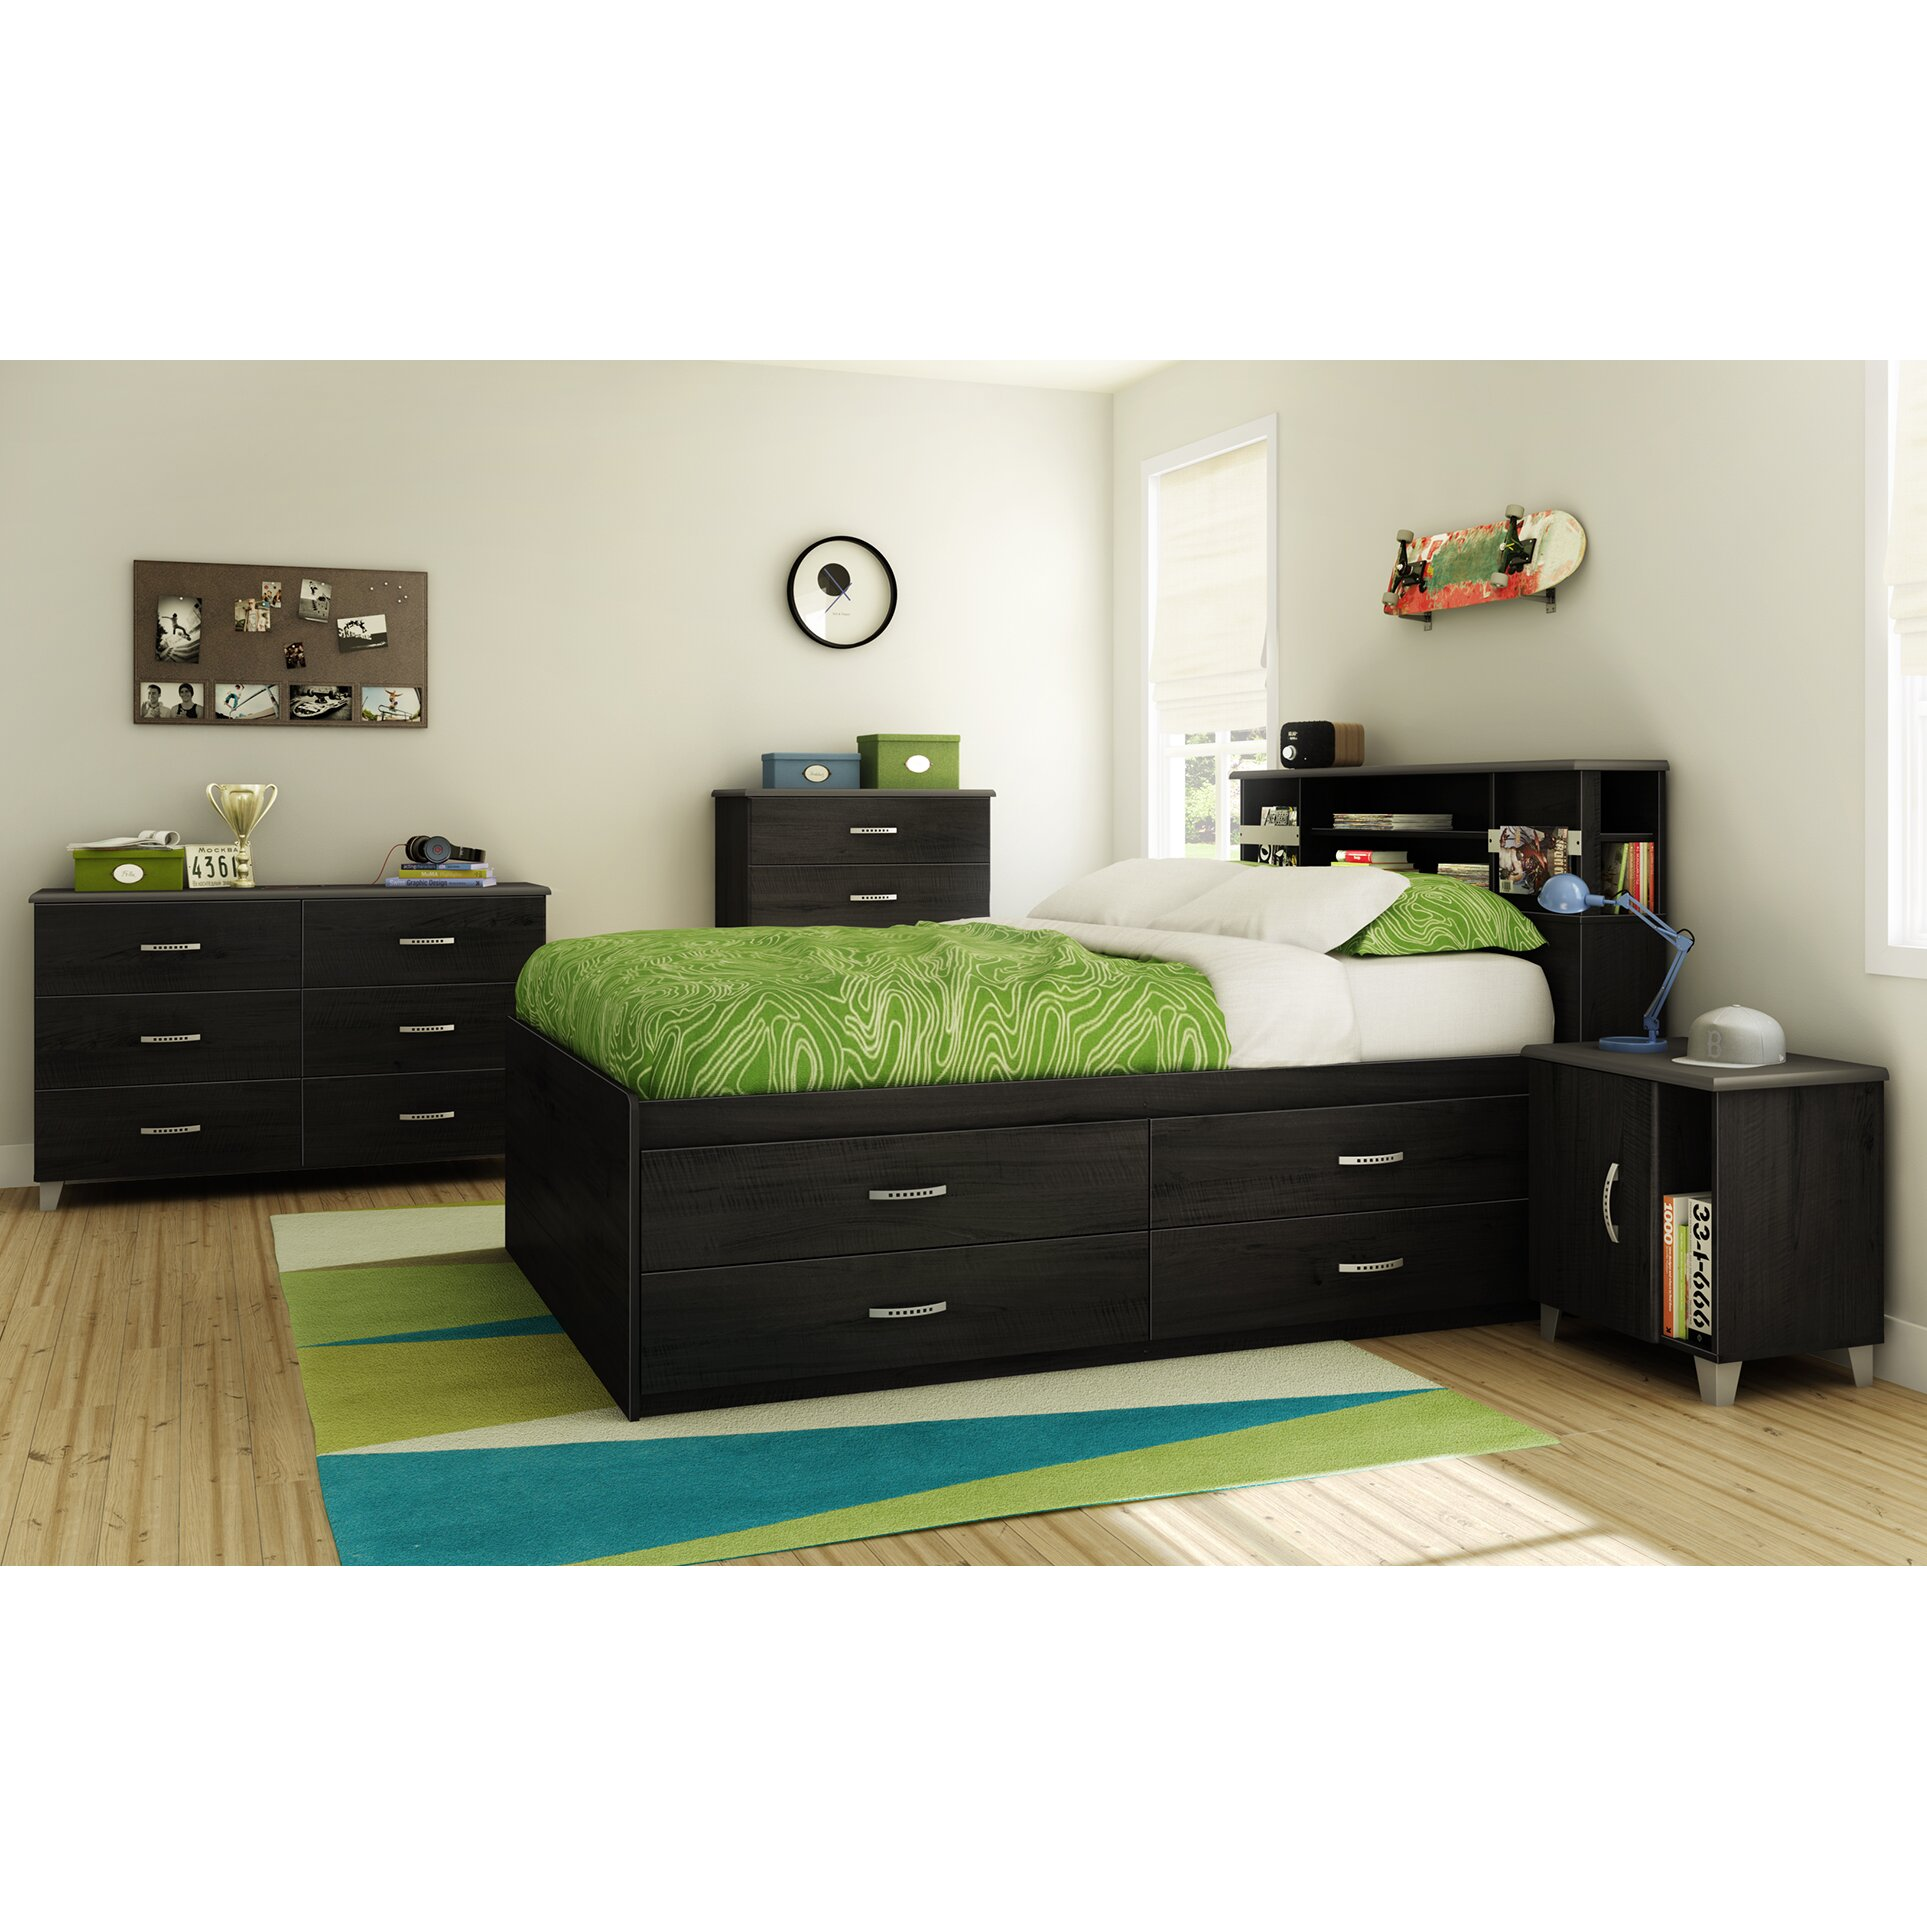 South shore lazer full platform customizable bedroom - South shore furniture bedroom sets ...